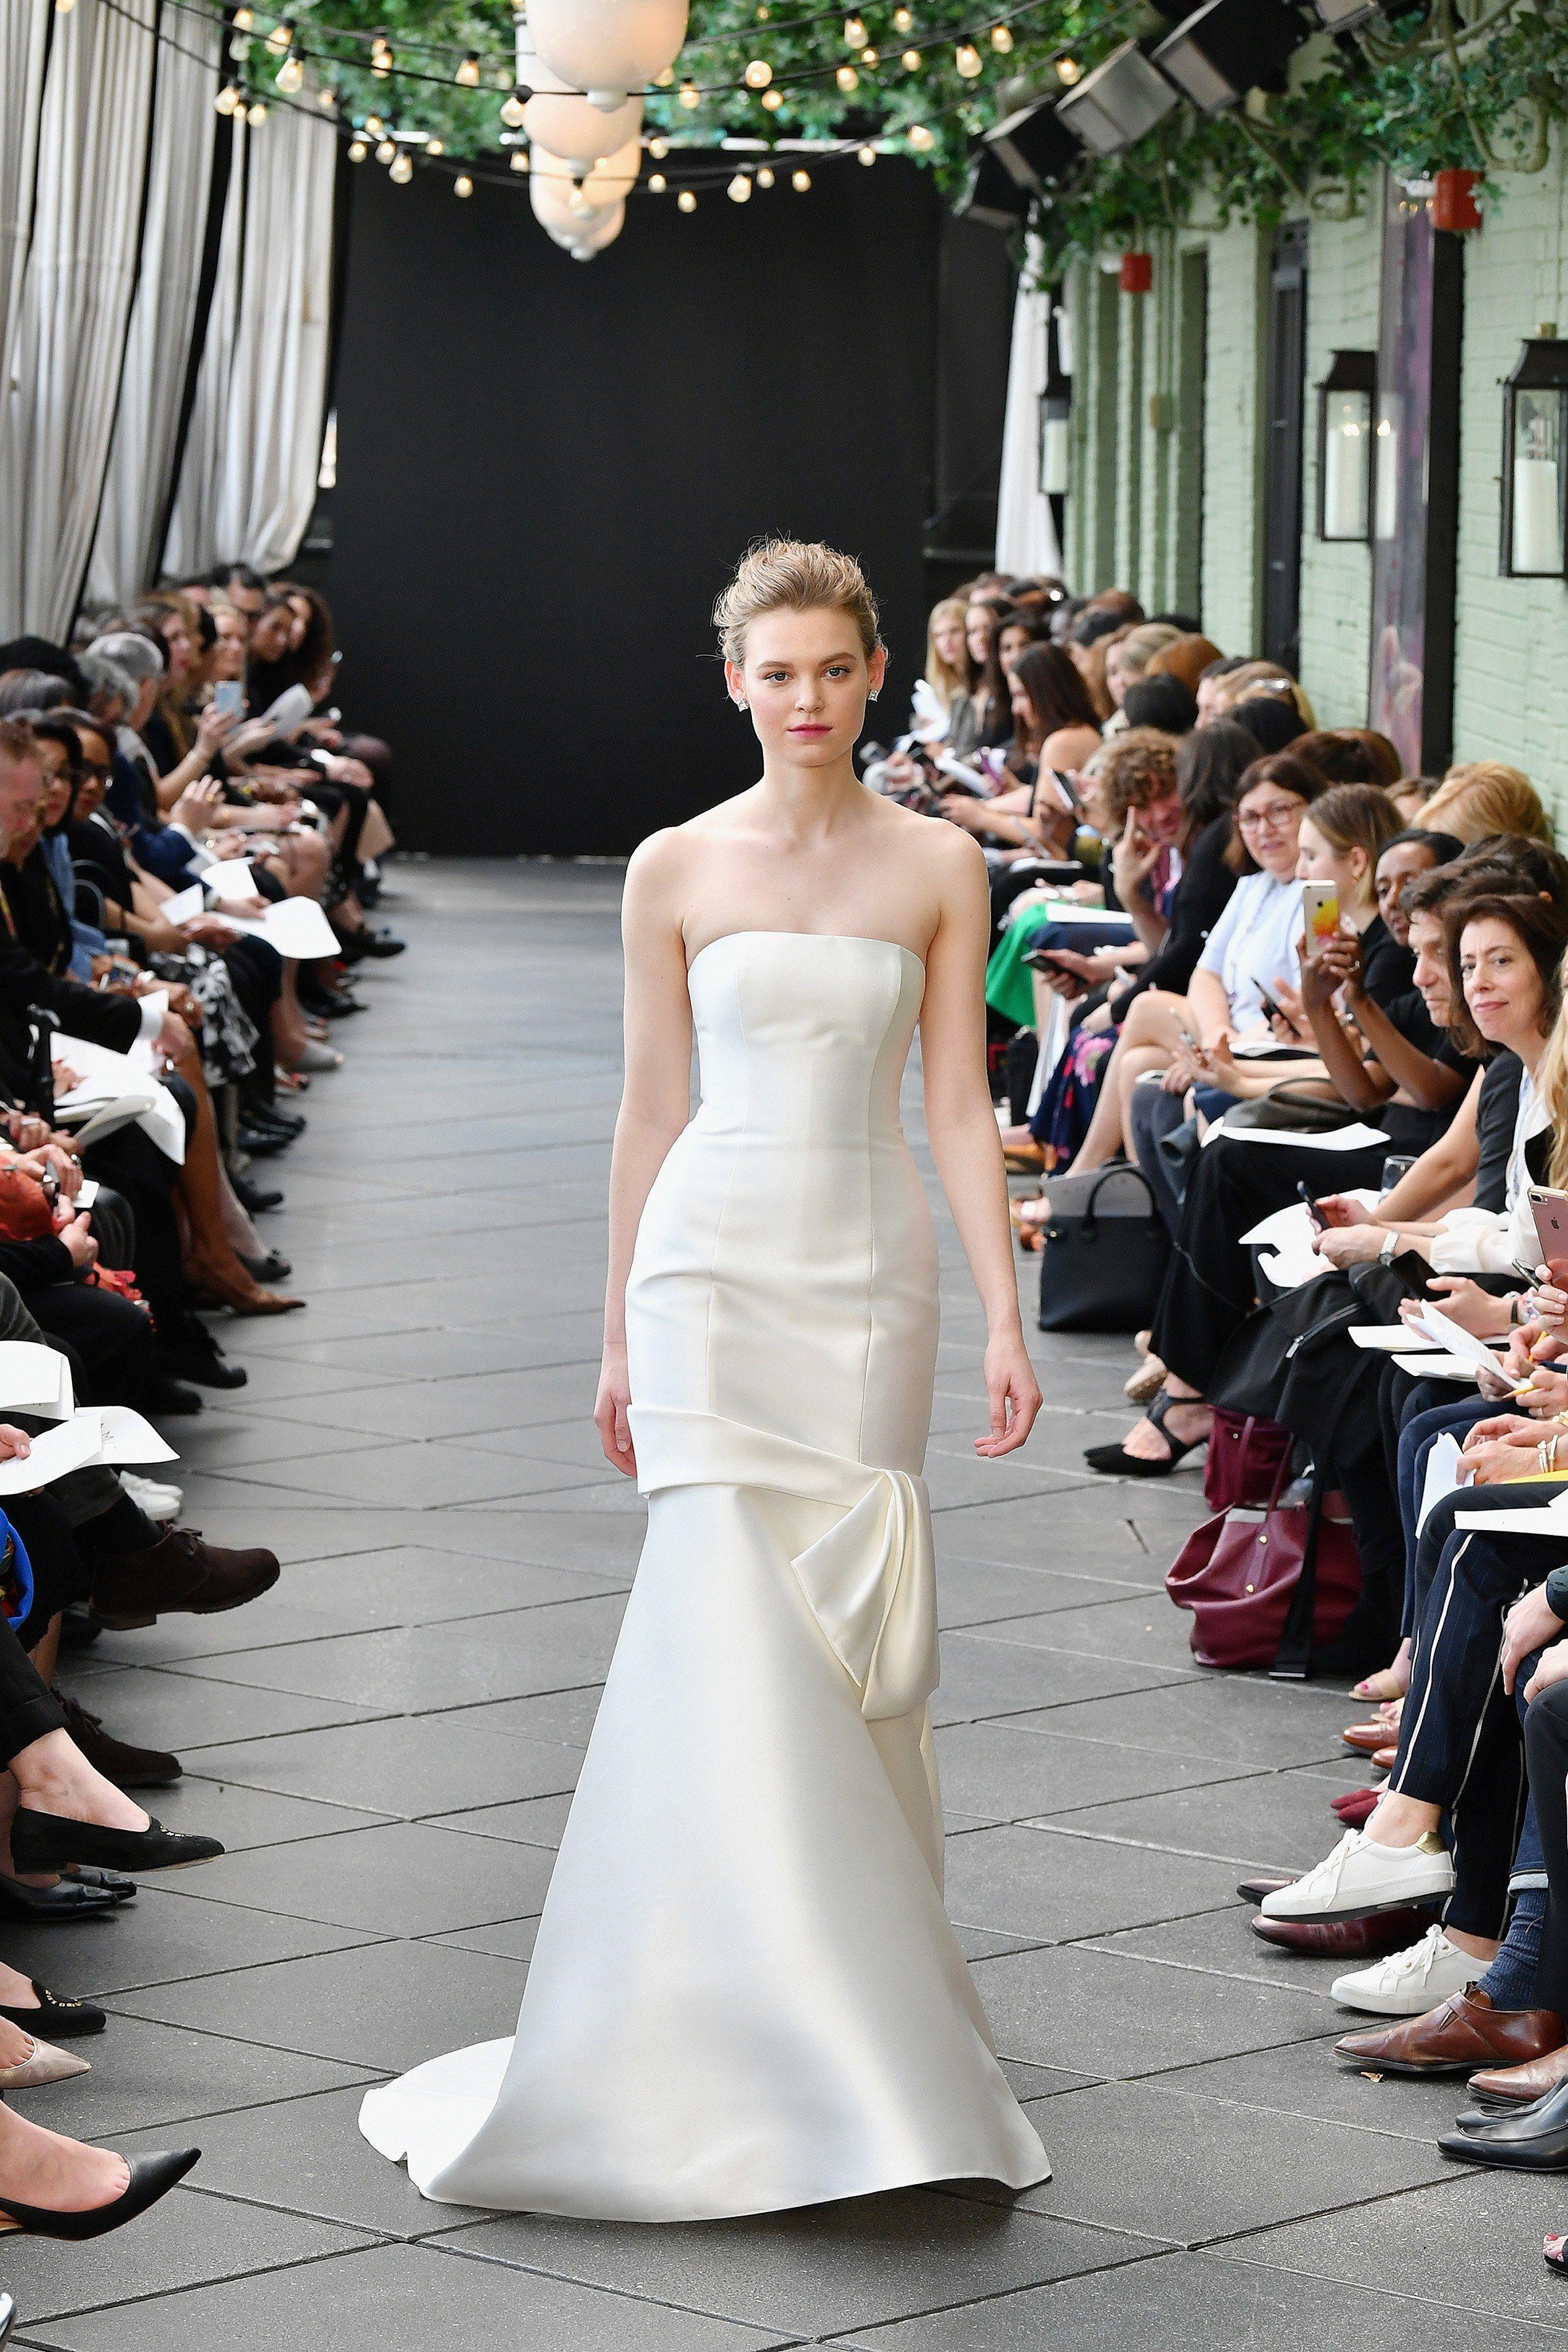 Nouvelle Amsale Bridal Wedding Dress Collection Spring 2019